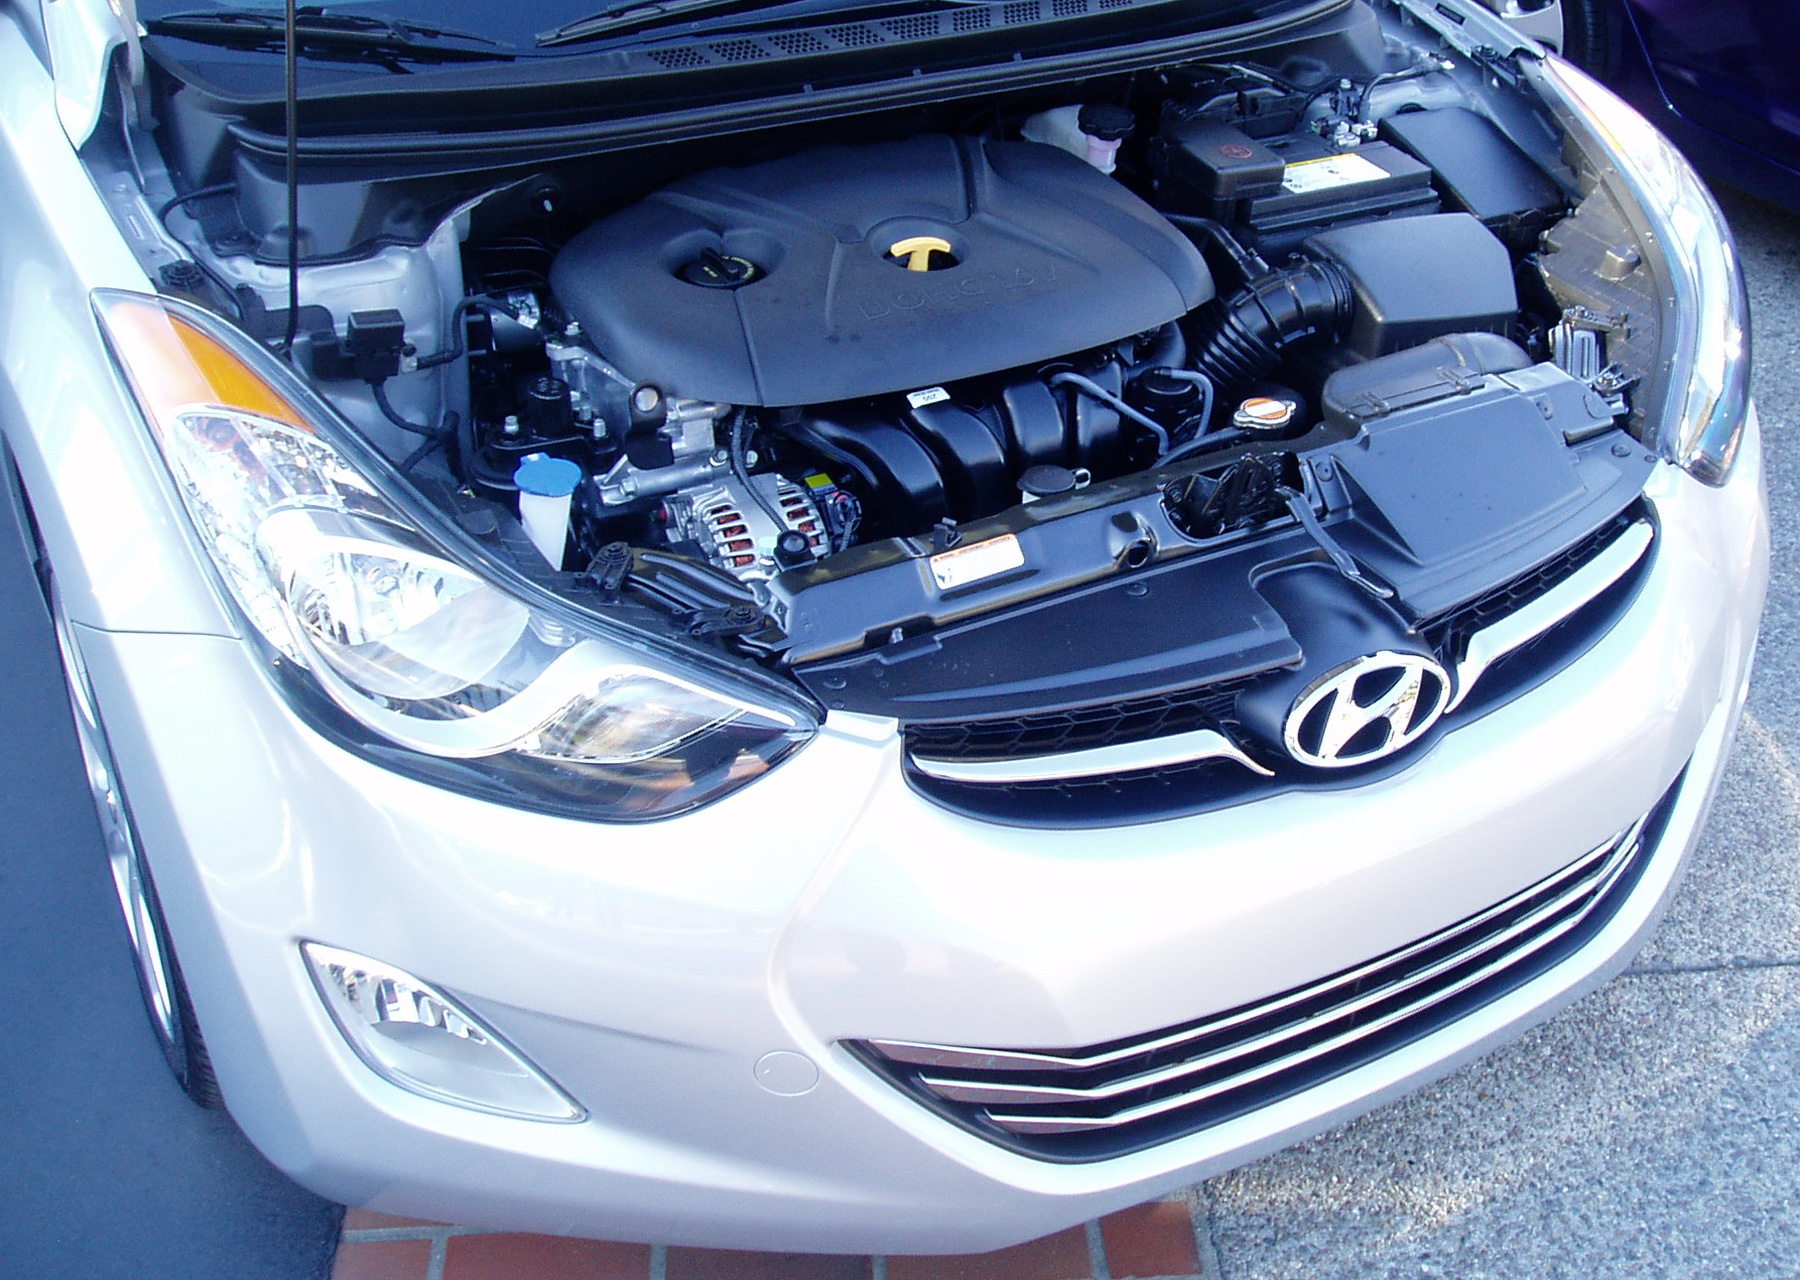 Test Drive: 2011 Hyundai Elantra – Our Auto Expert